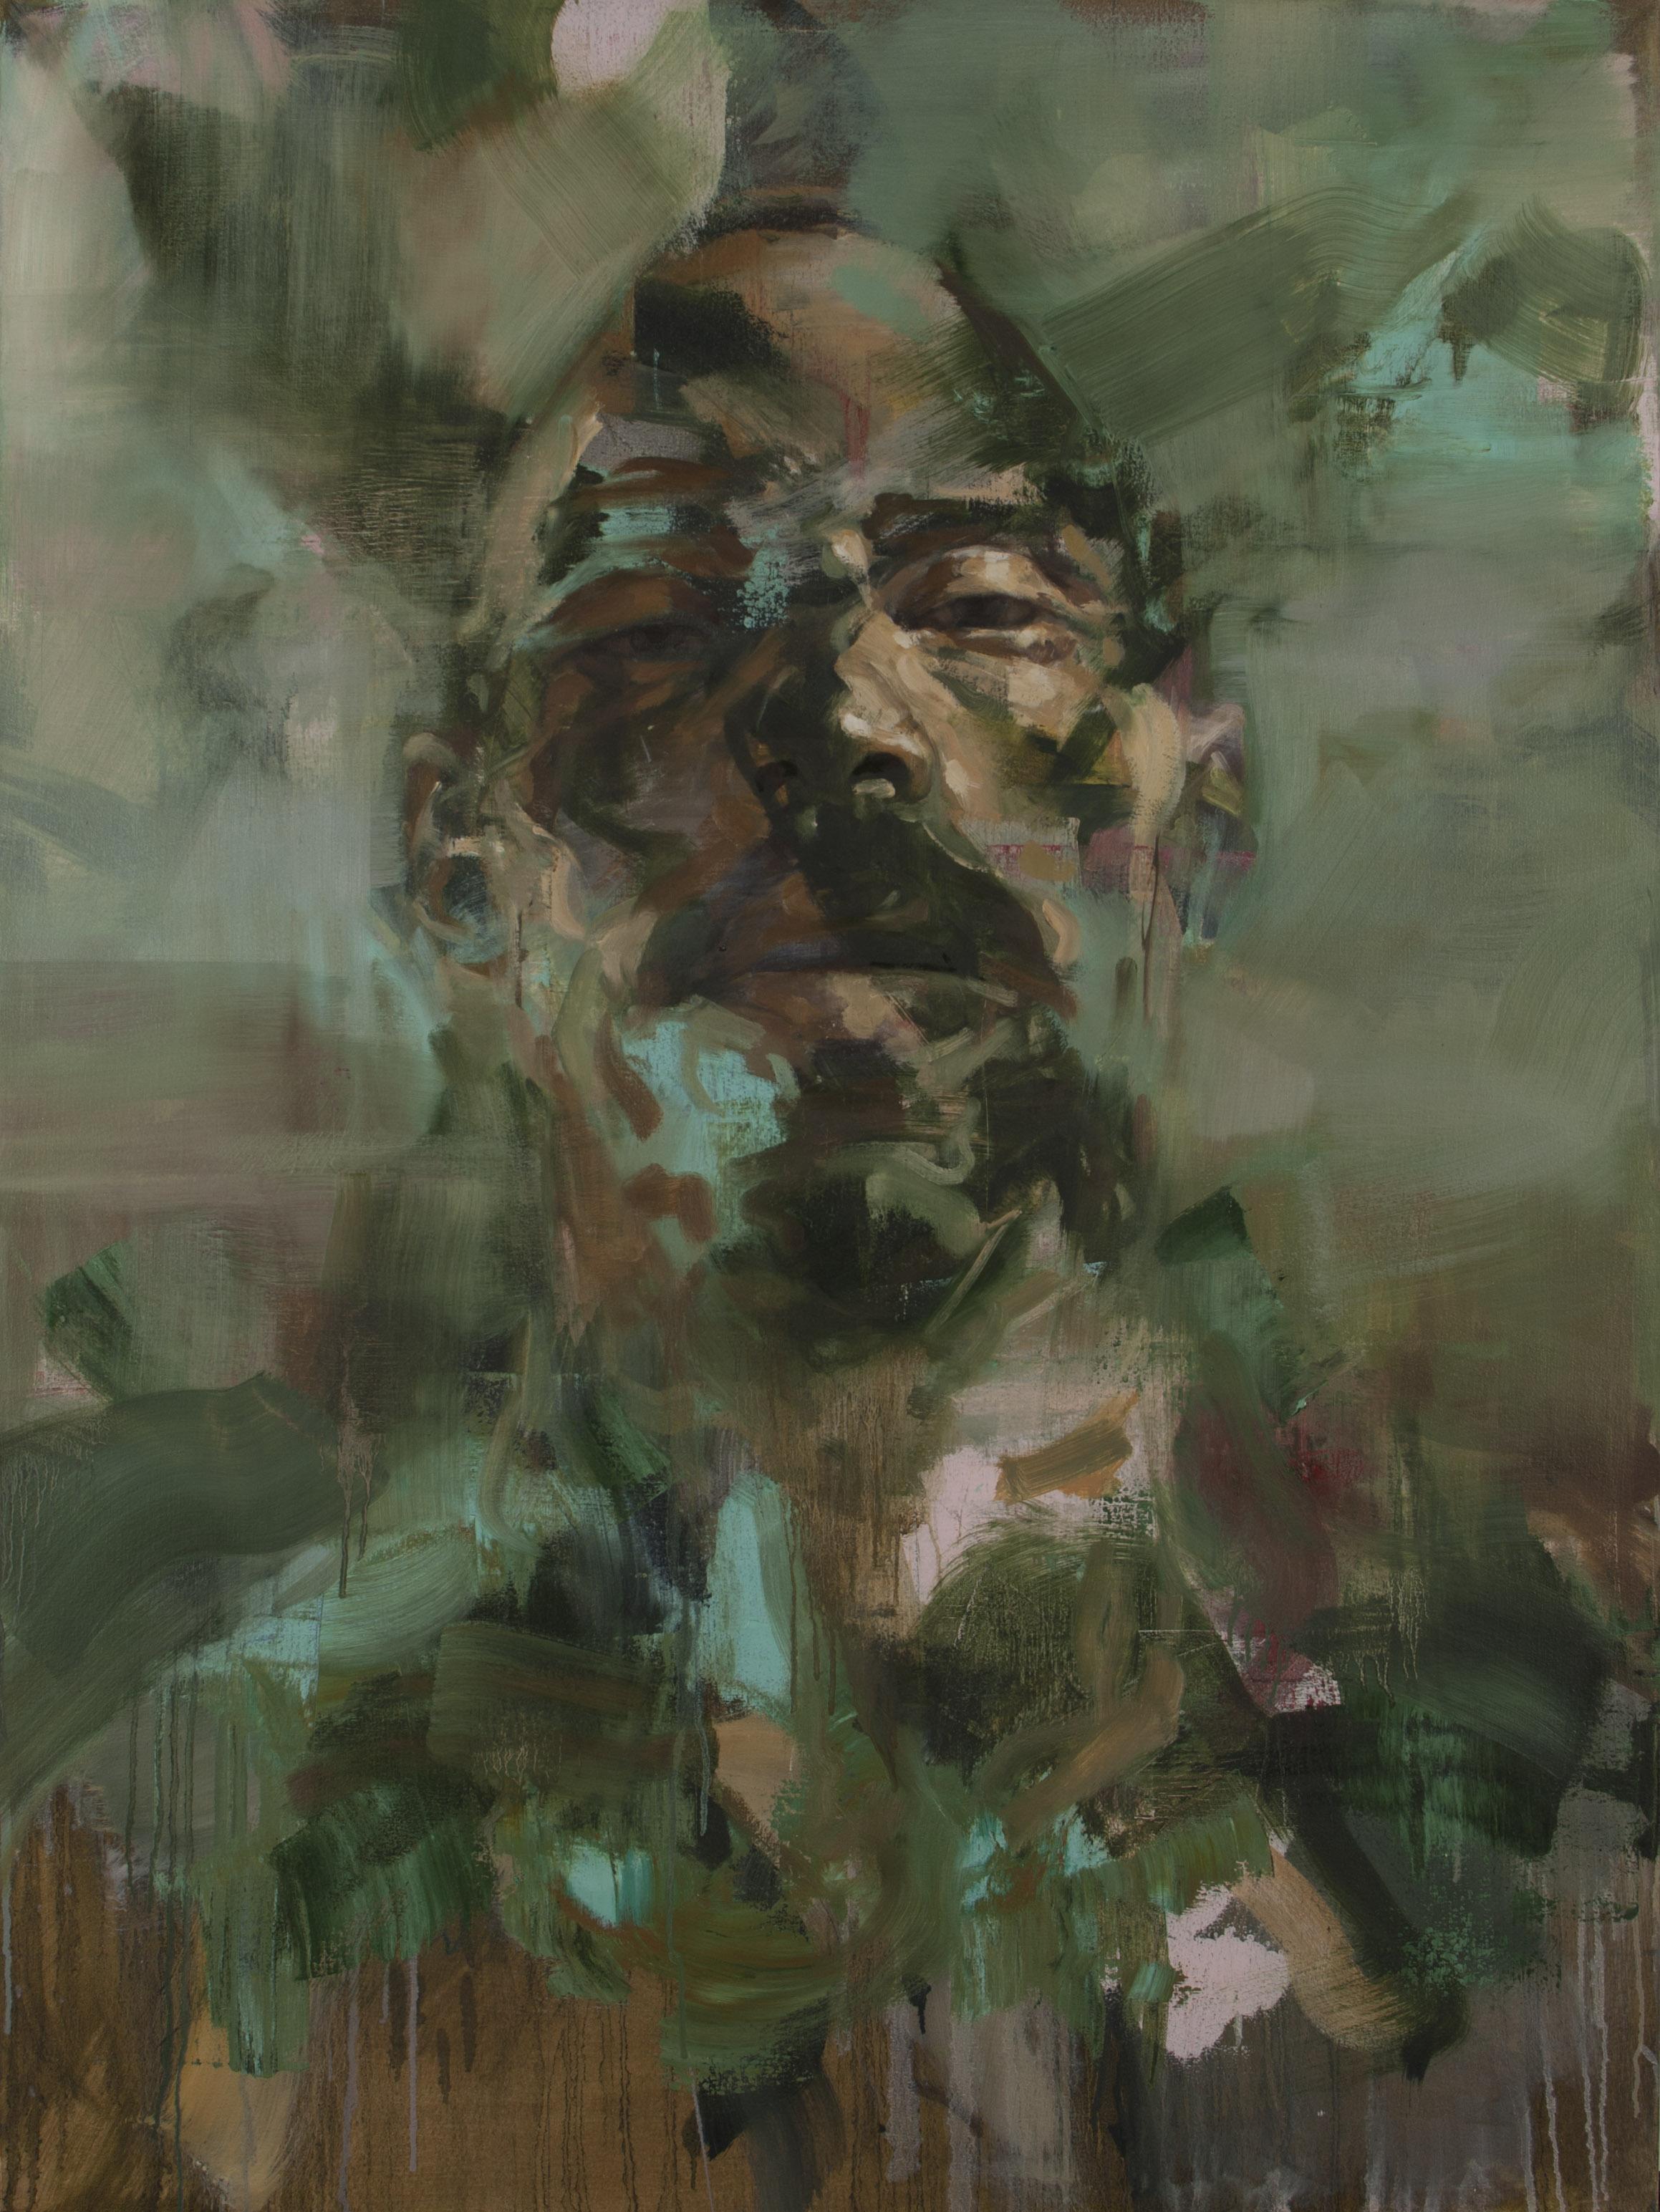 Shadow Self Self-Portrait #2